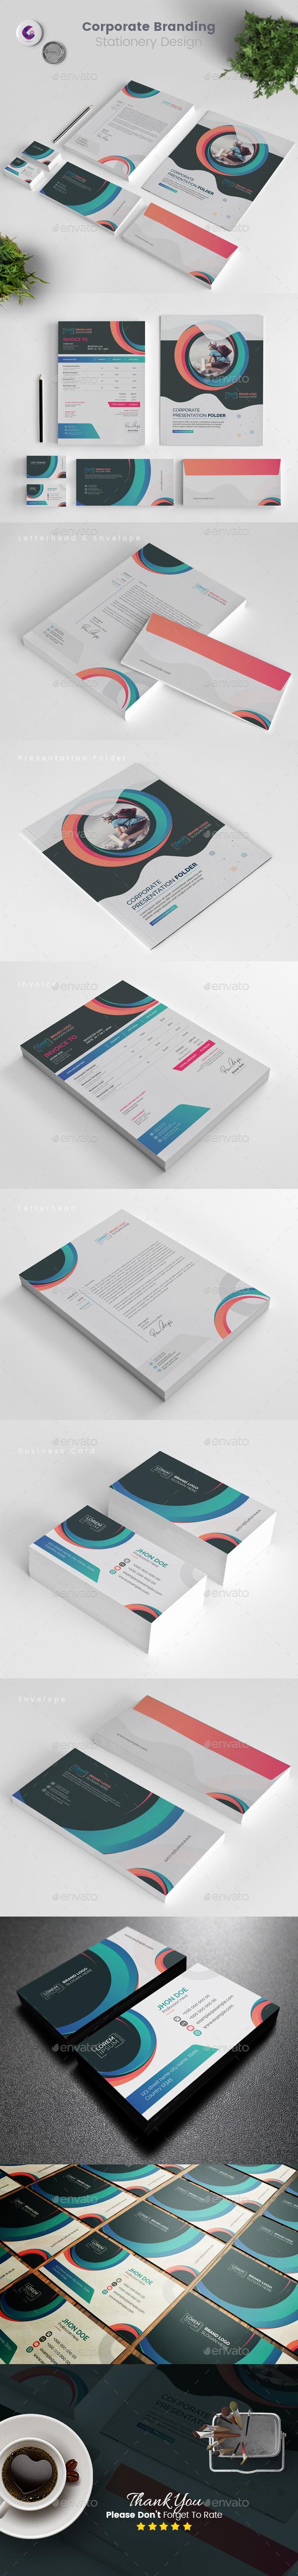 Branding Stationery Template - Stationery Print Templates